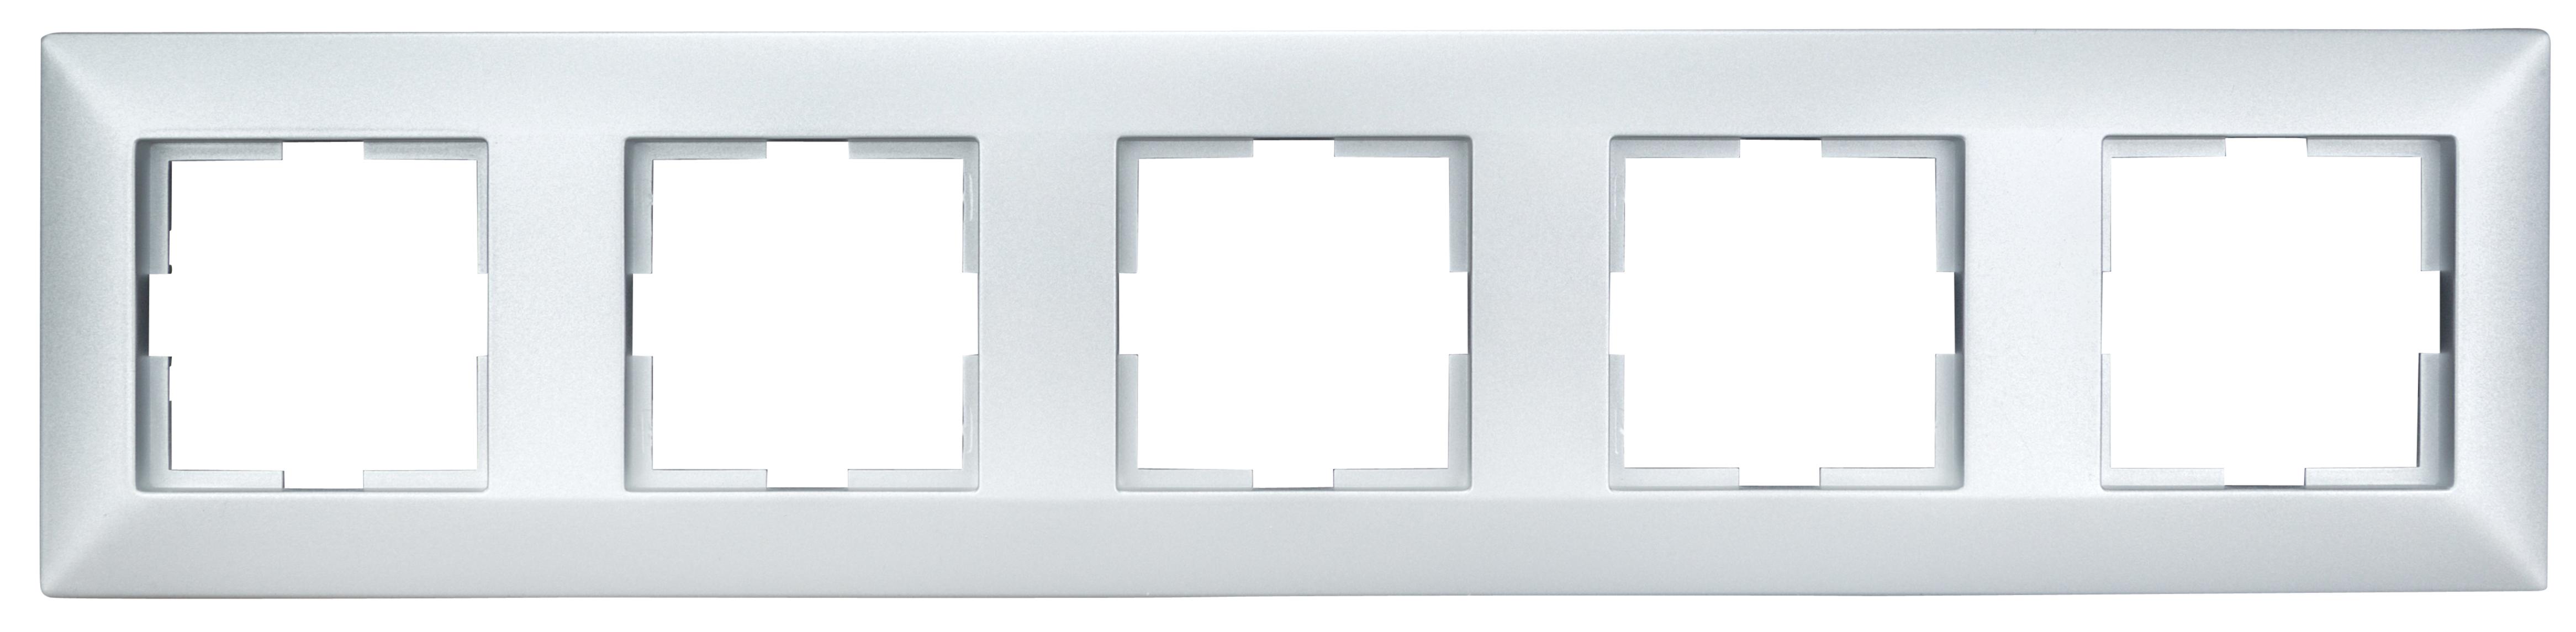 1 Stk Rahmen 5-fach, Silber EV125005--